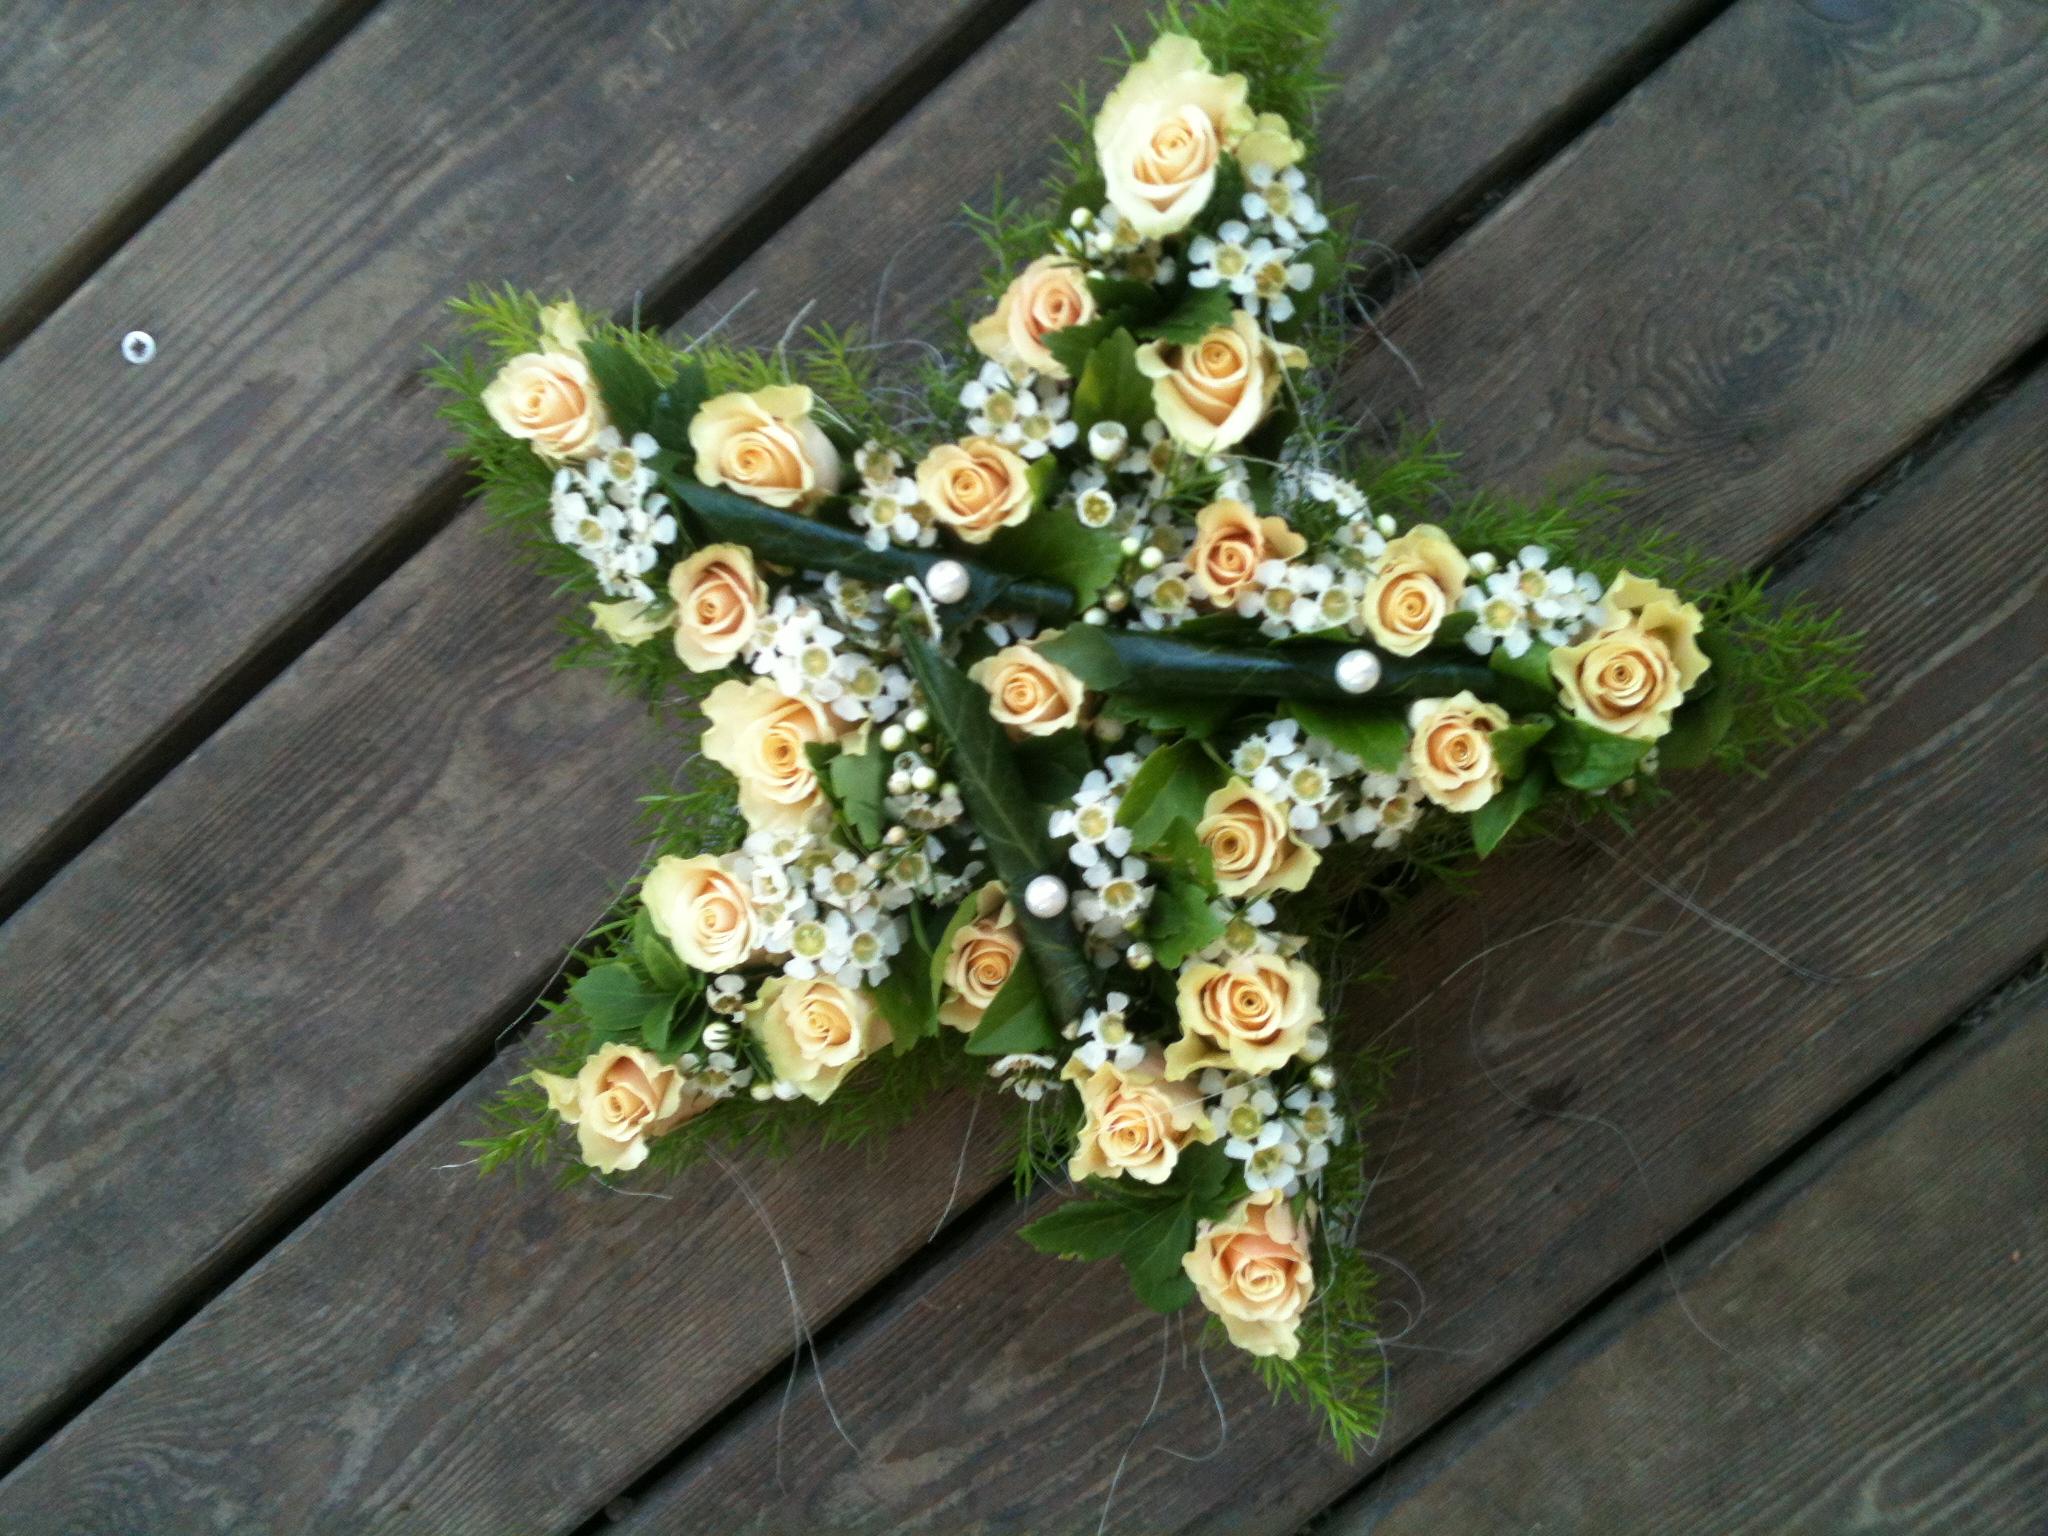 Blumenladen Detmold trauerfloristik gärtnerei diekmann